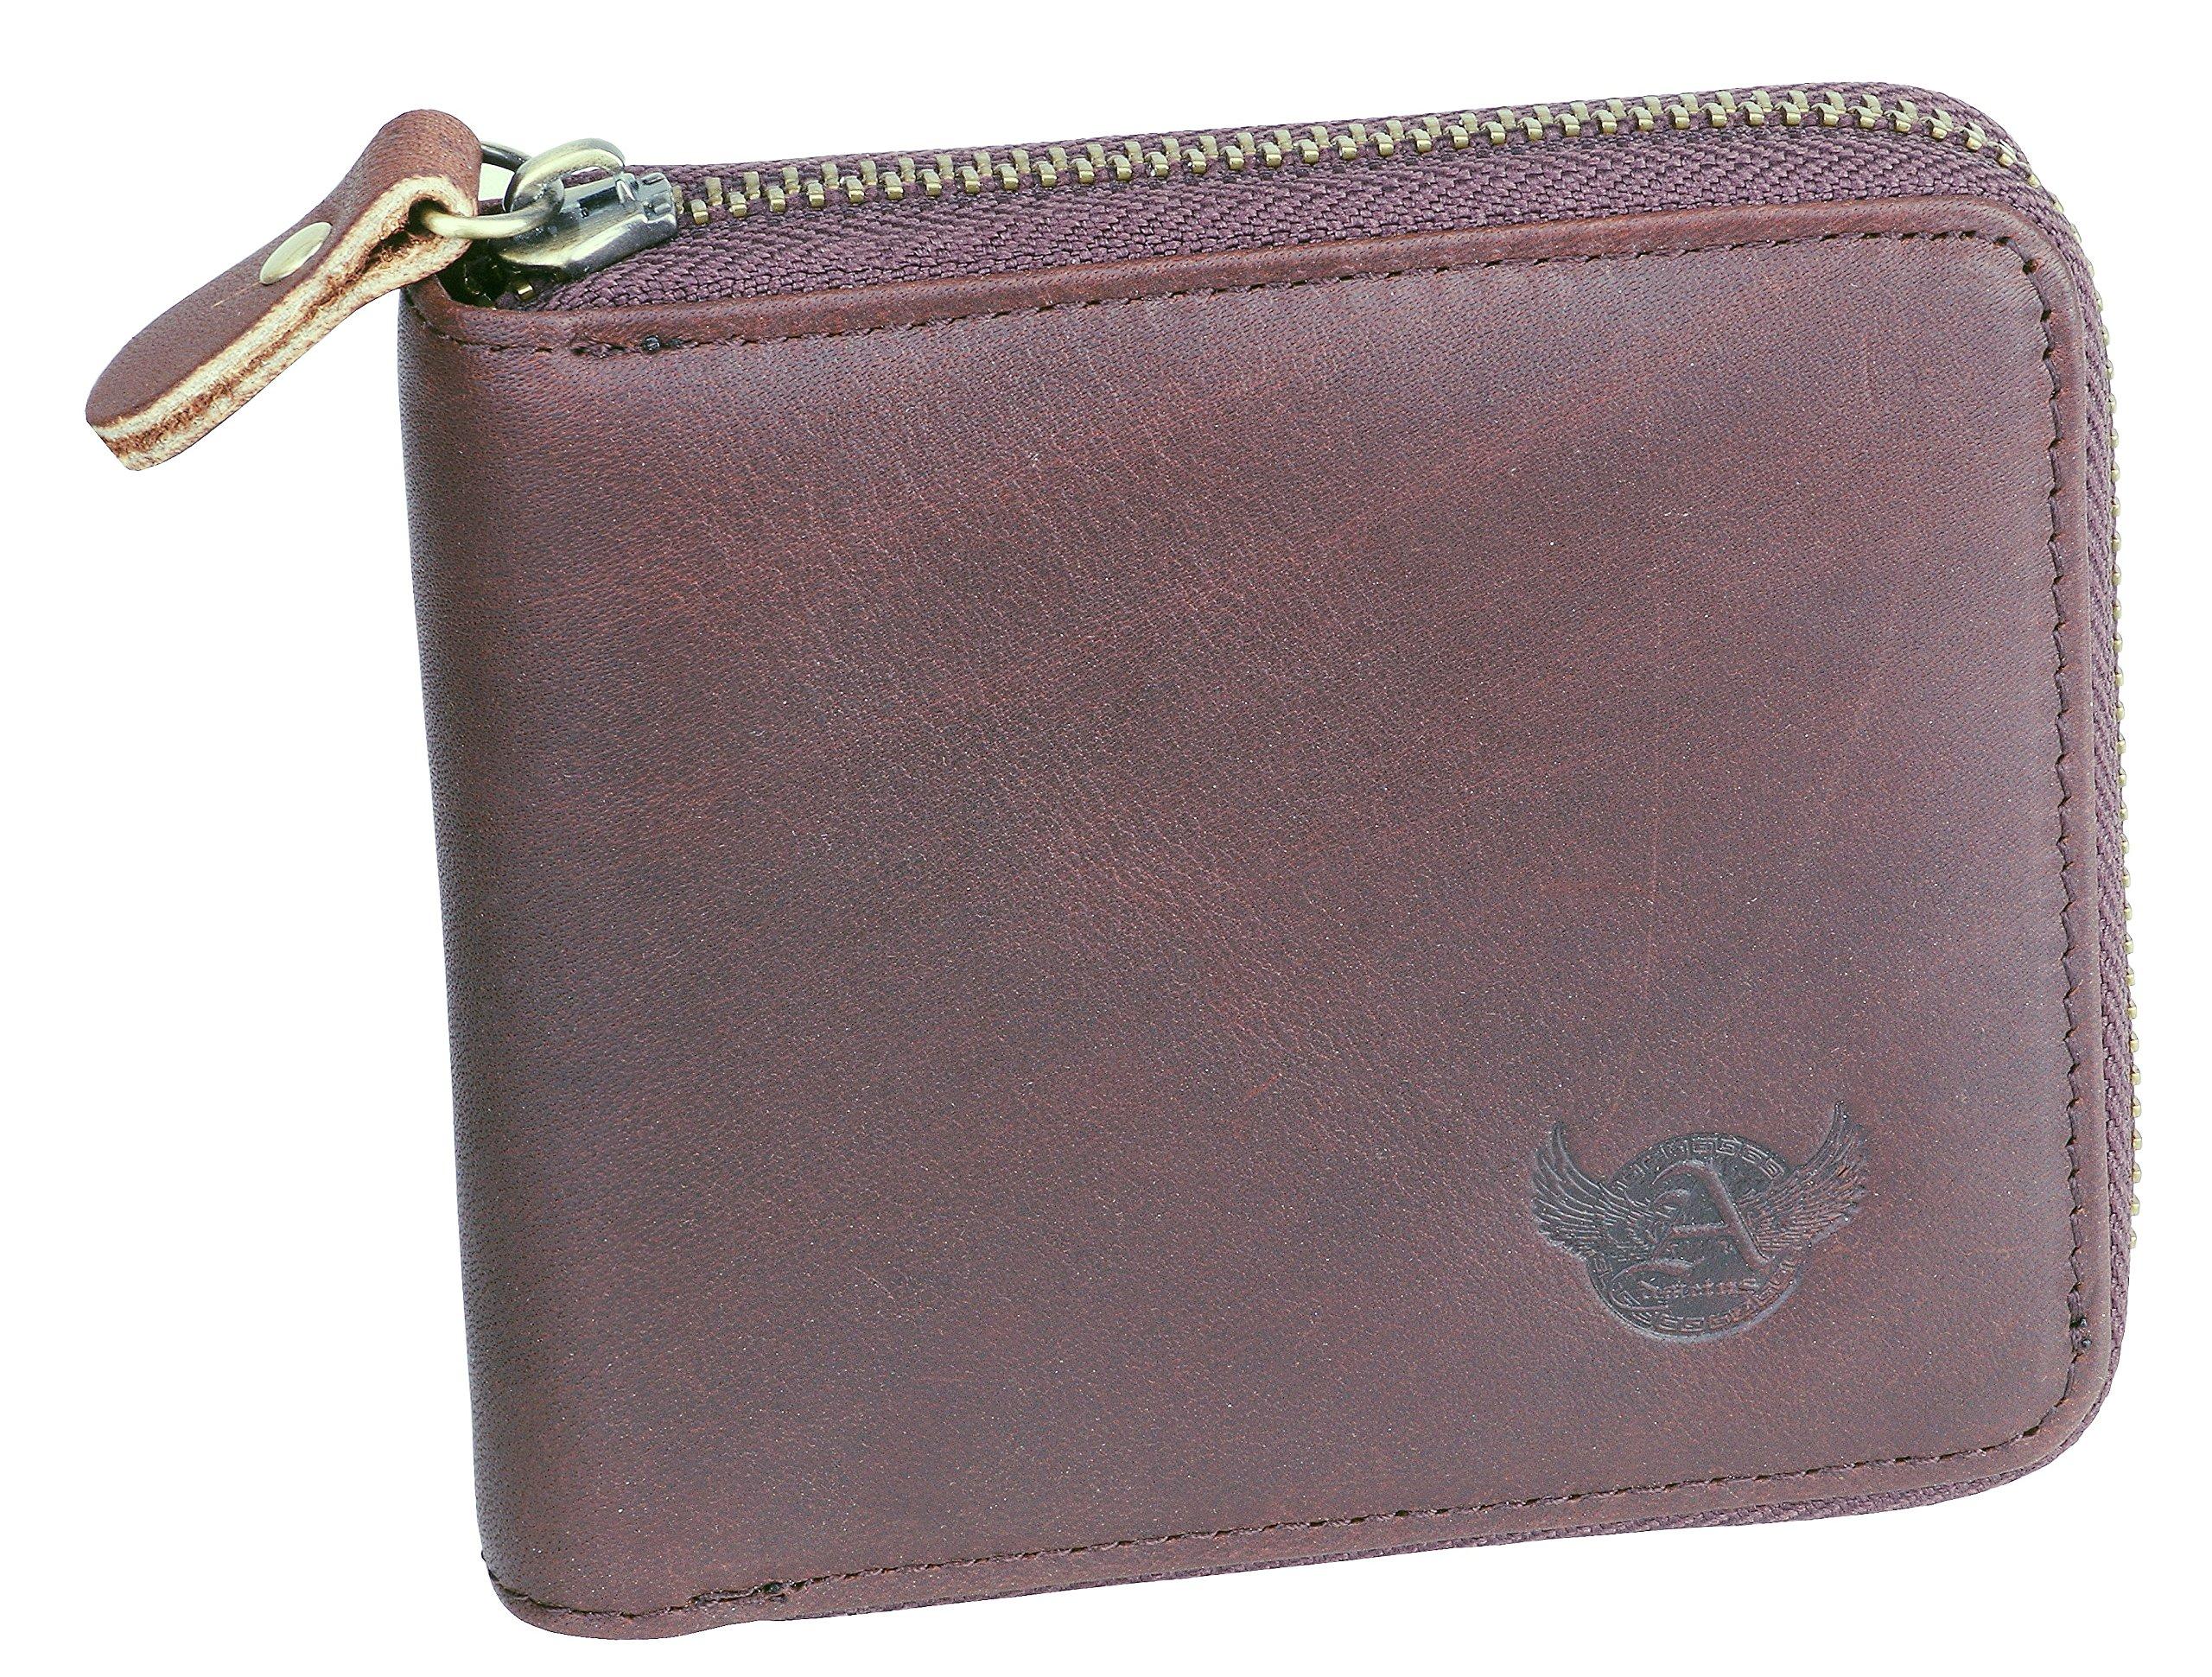 Admetus Men's Genuine Leather Short Zip-around Bifold Zero credit card ID Wallet